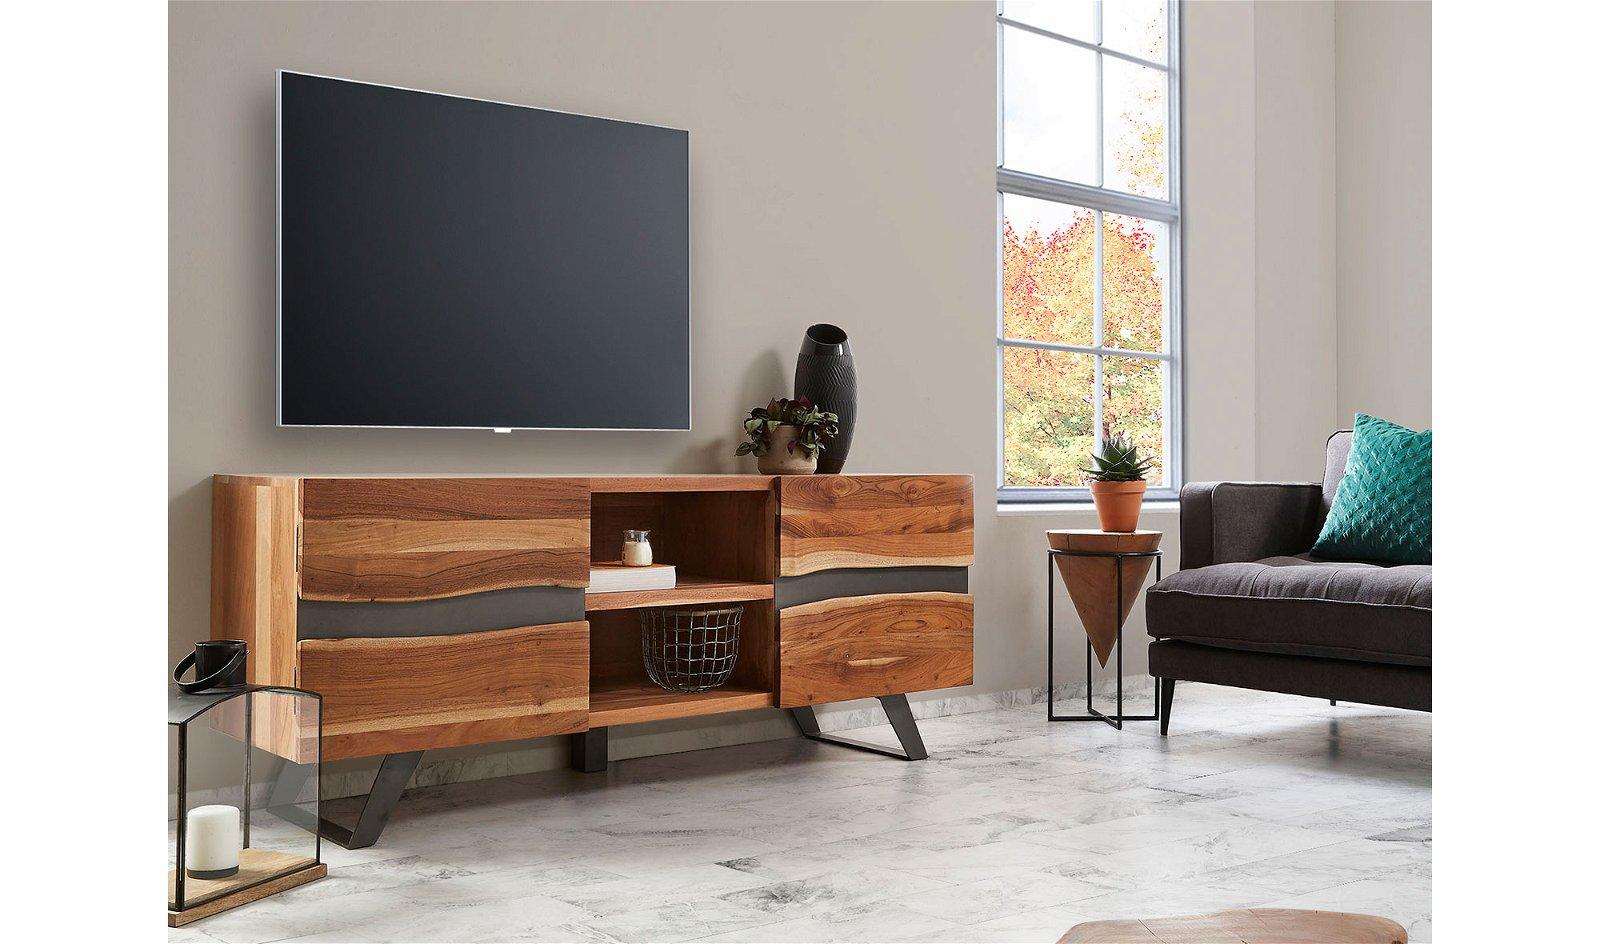 Mueble TV Acacia natural Irvin